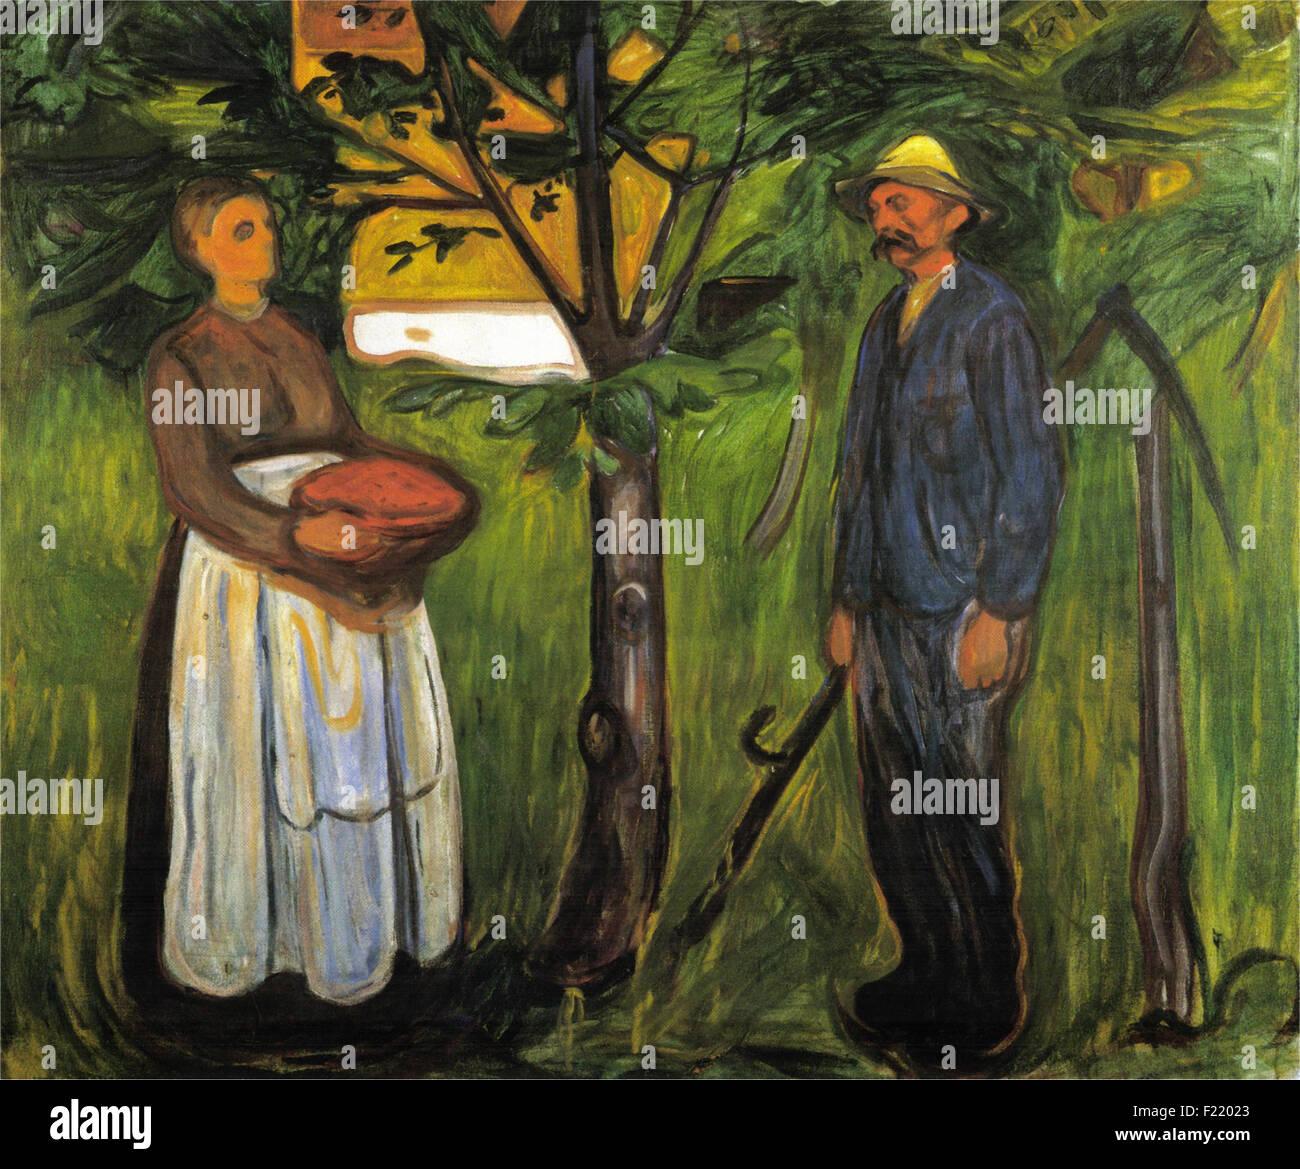 Edvard Munch - Fertility II - Stock Image